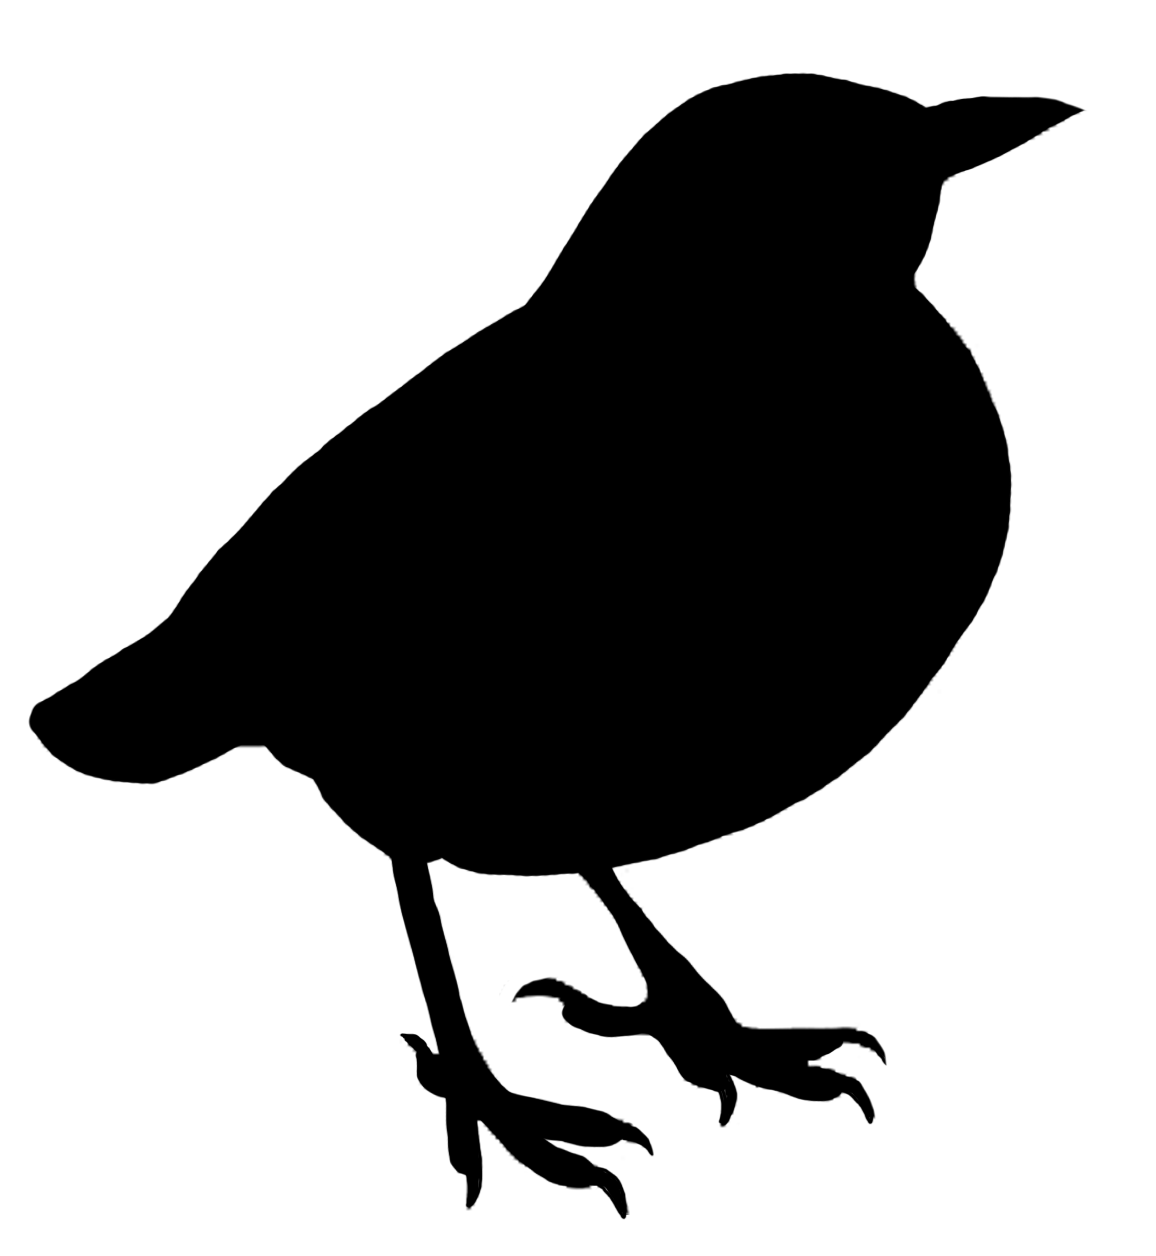 Bird silhouette transparent png. Clipart park birds